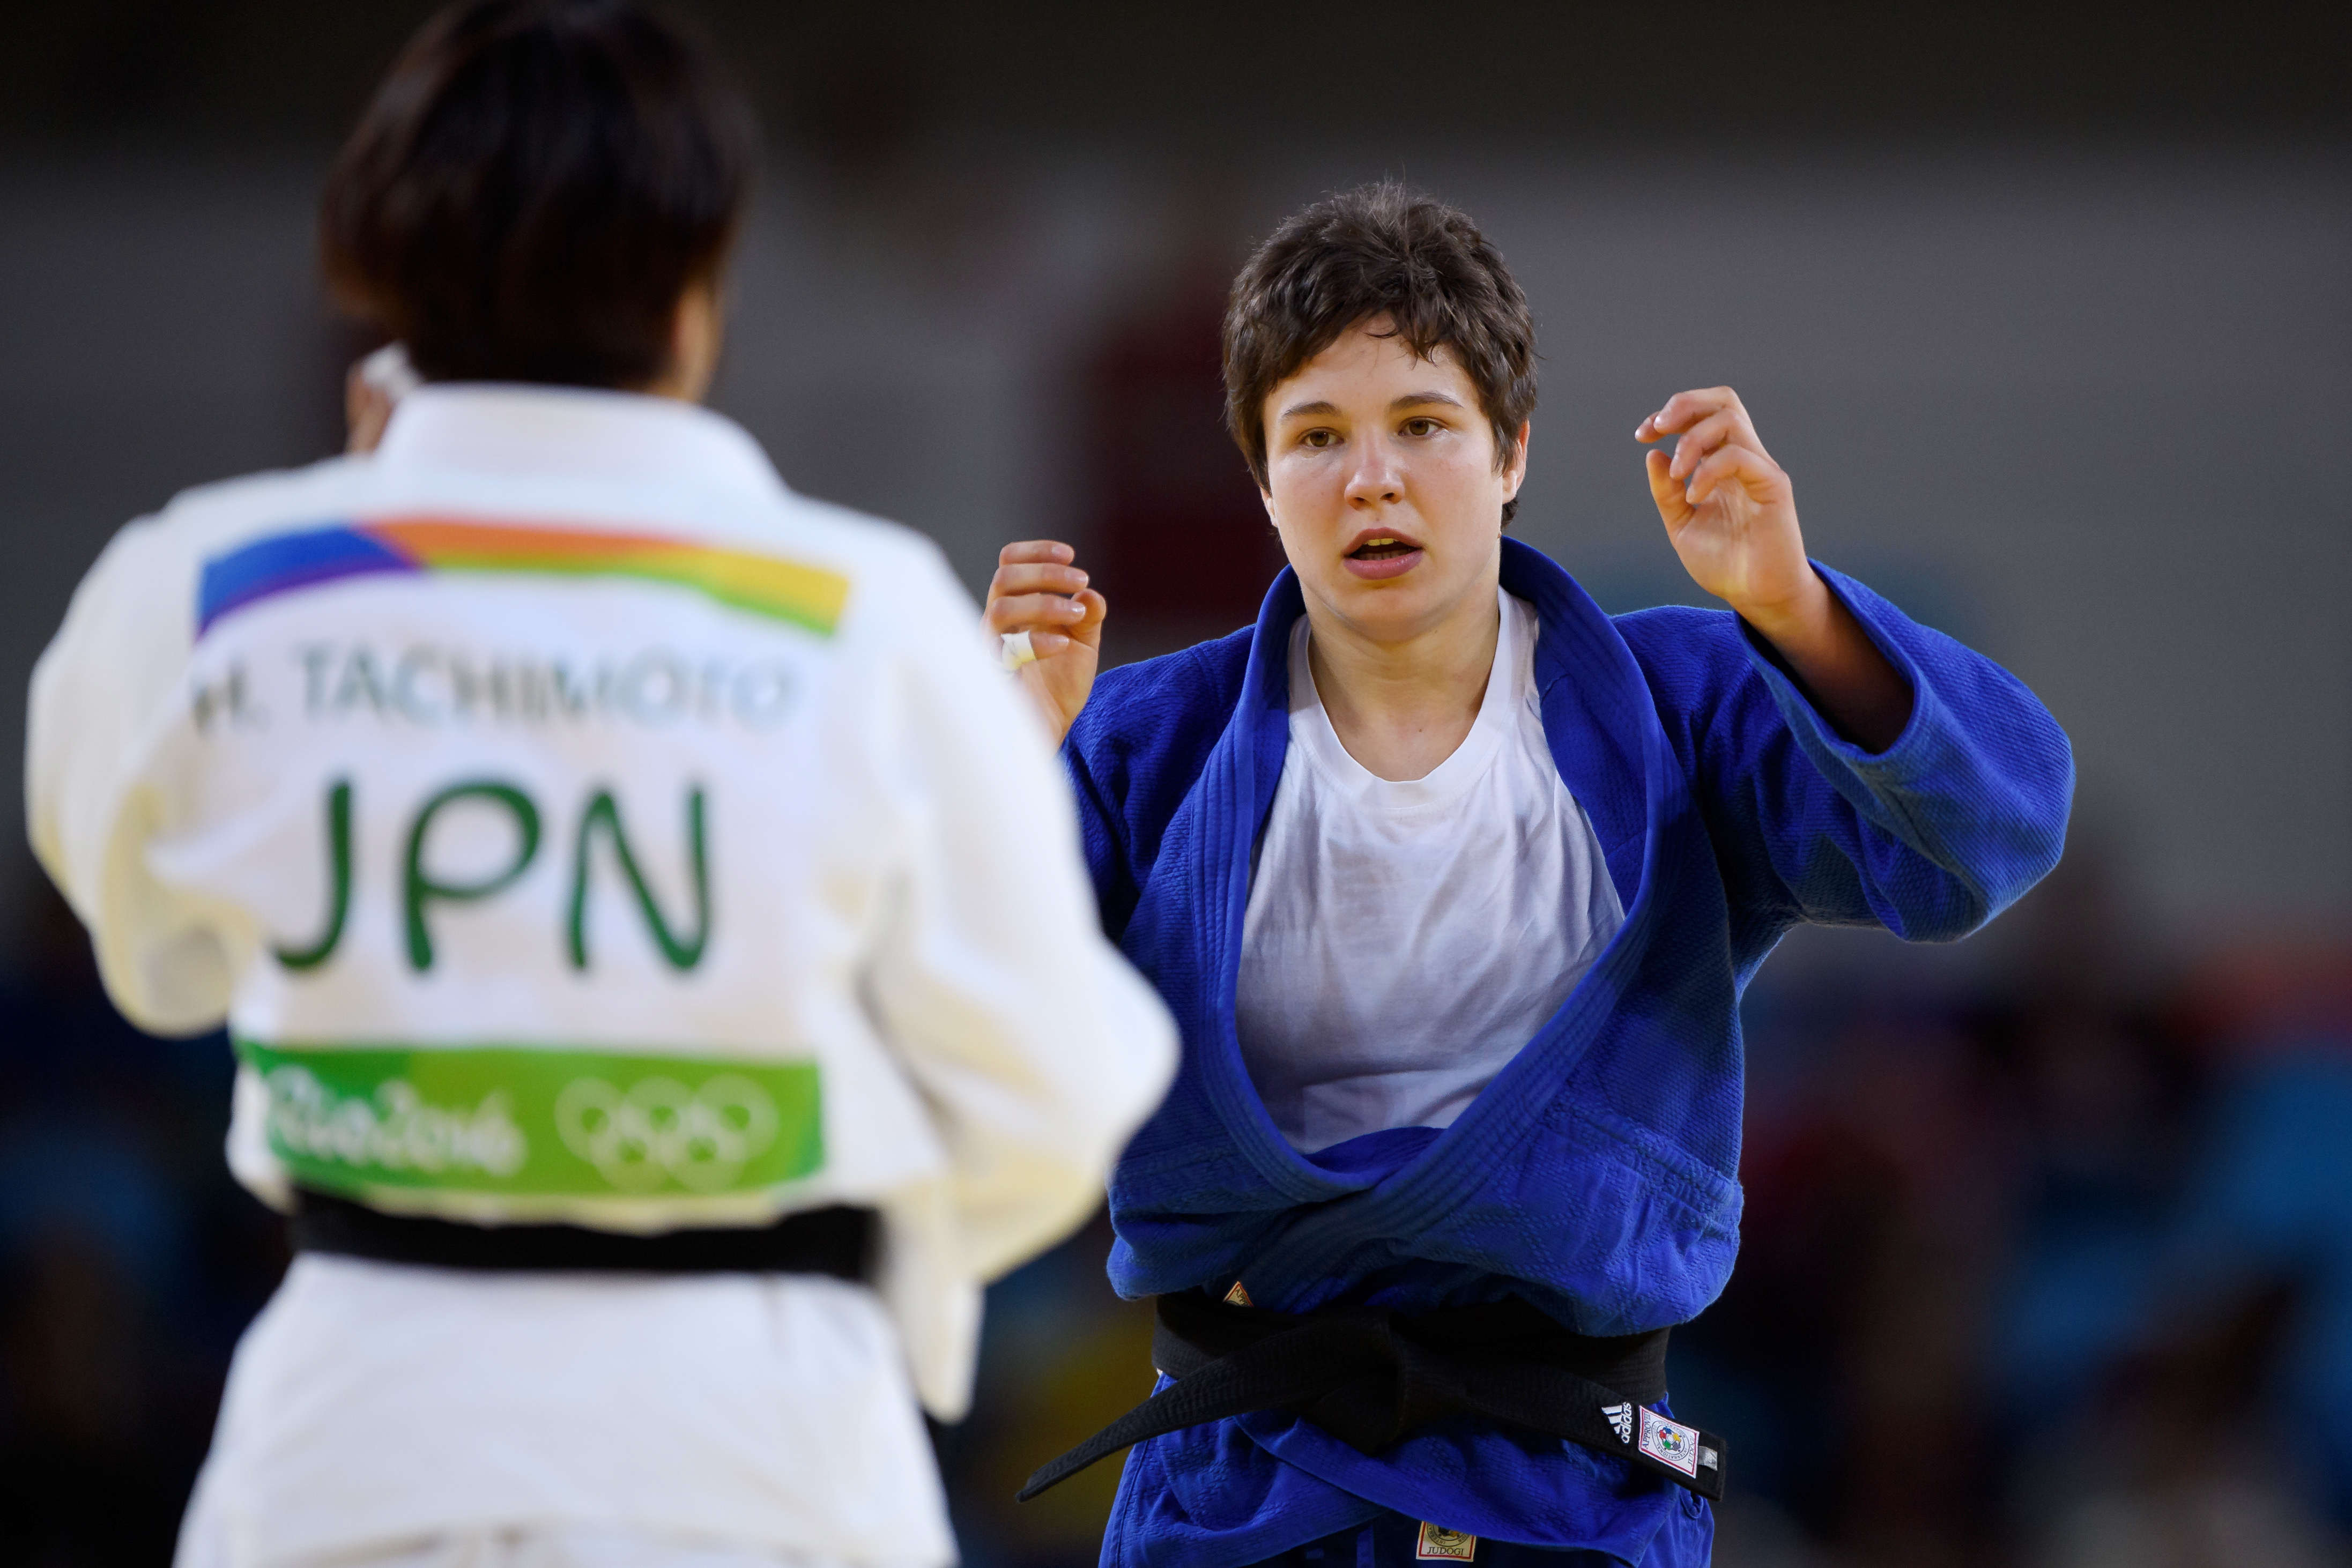 Halbfinale Frauen 70kg: Laura Vargas-Koch (GER, blau) gegen Haruka Tachimoto (JPN, weiß). GES/ Olympia 2016/ Judo, 10.08.2016 Olympics 2016: Judo, Rio de Janeiro, Brazil, August 10, 2016 | Verwendung weltweit